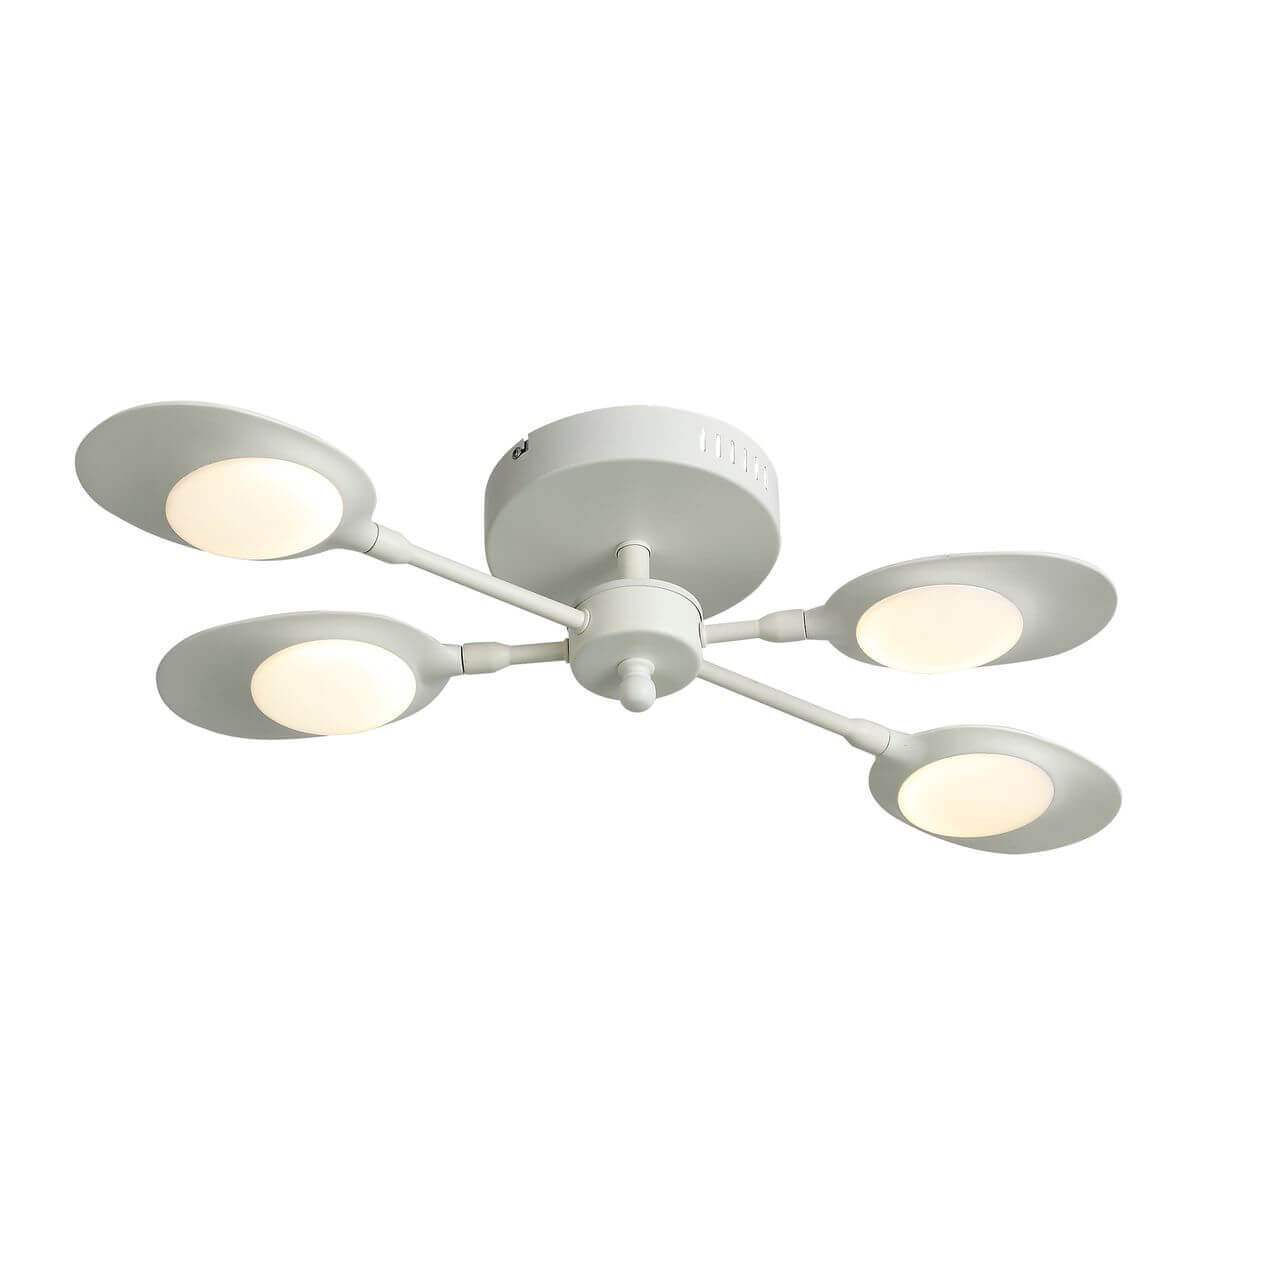 цена на Потолочная светодиодная люстра ST Luce Farfalla SL824.502.04